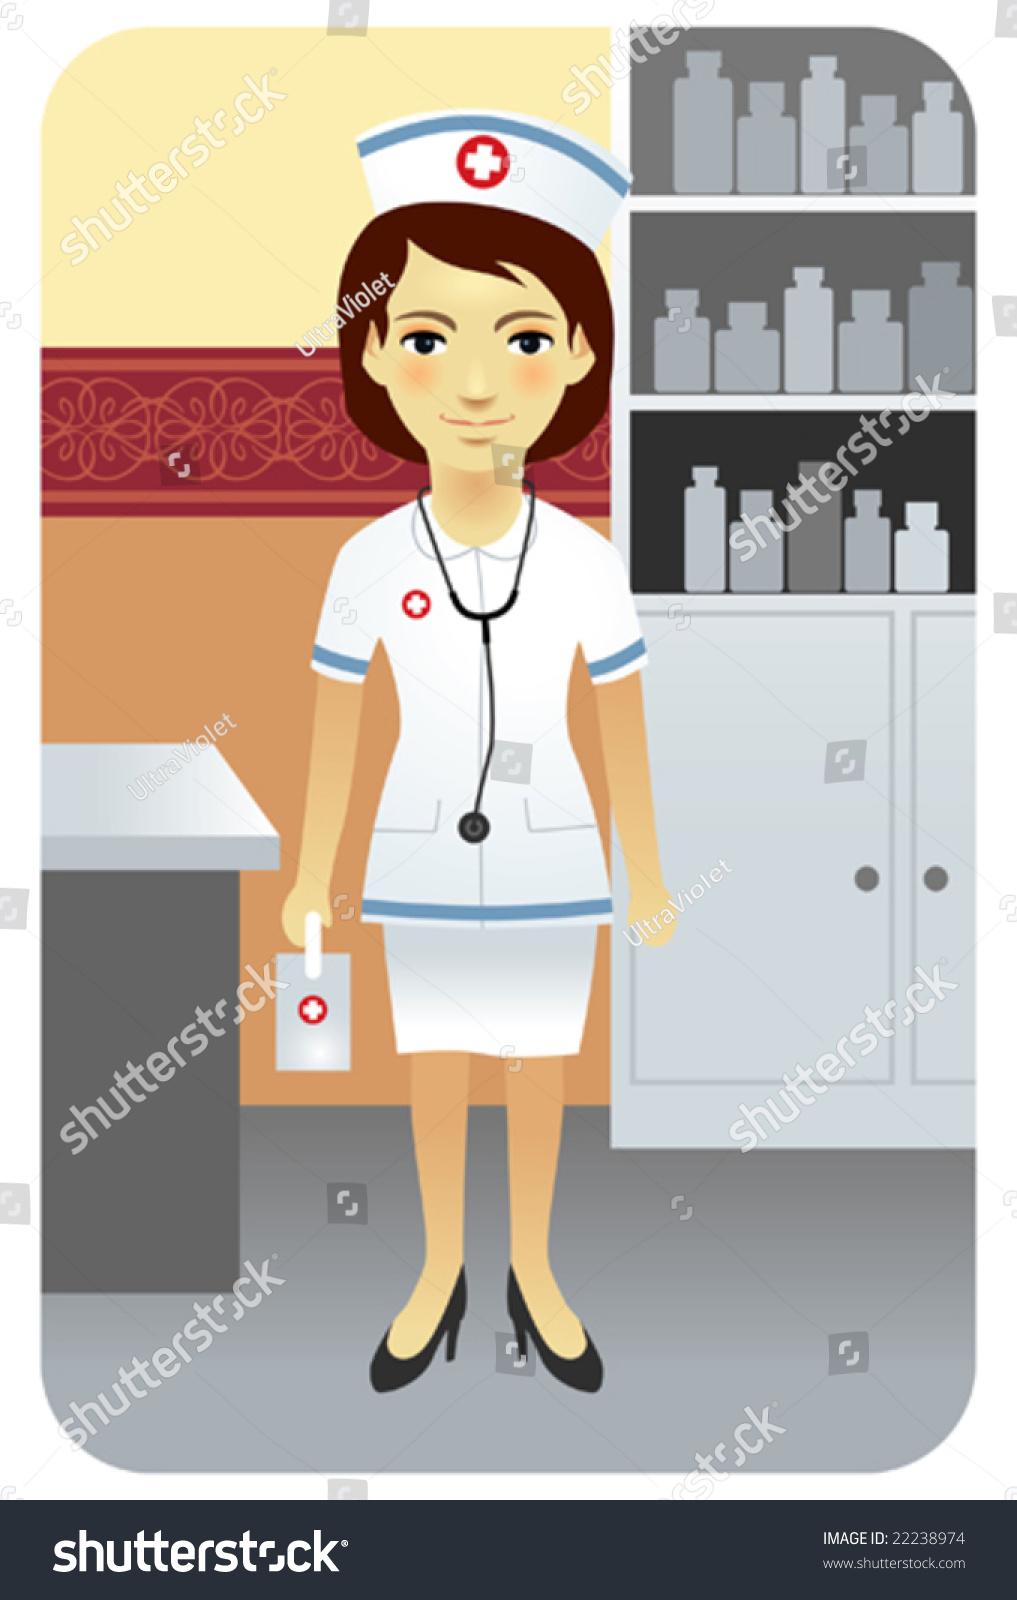 nurse images gallery க்கான பட முடிவு